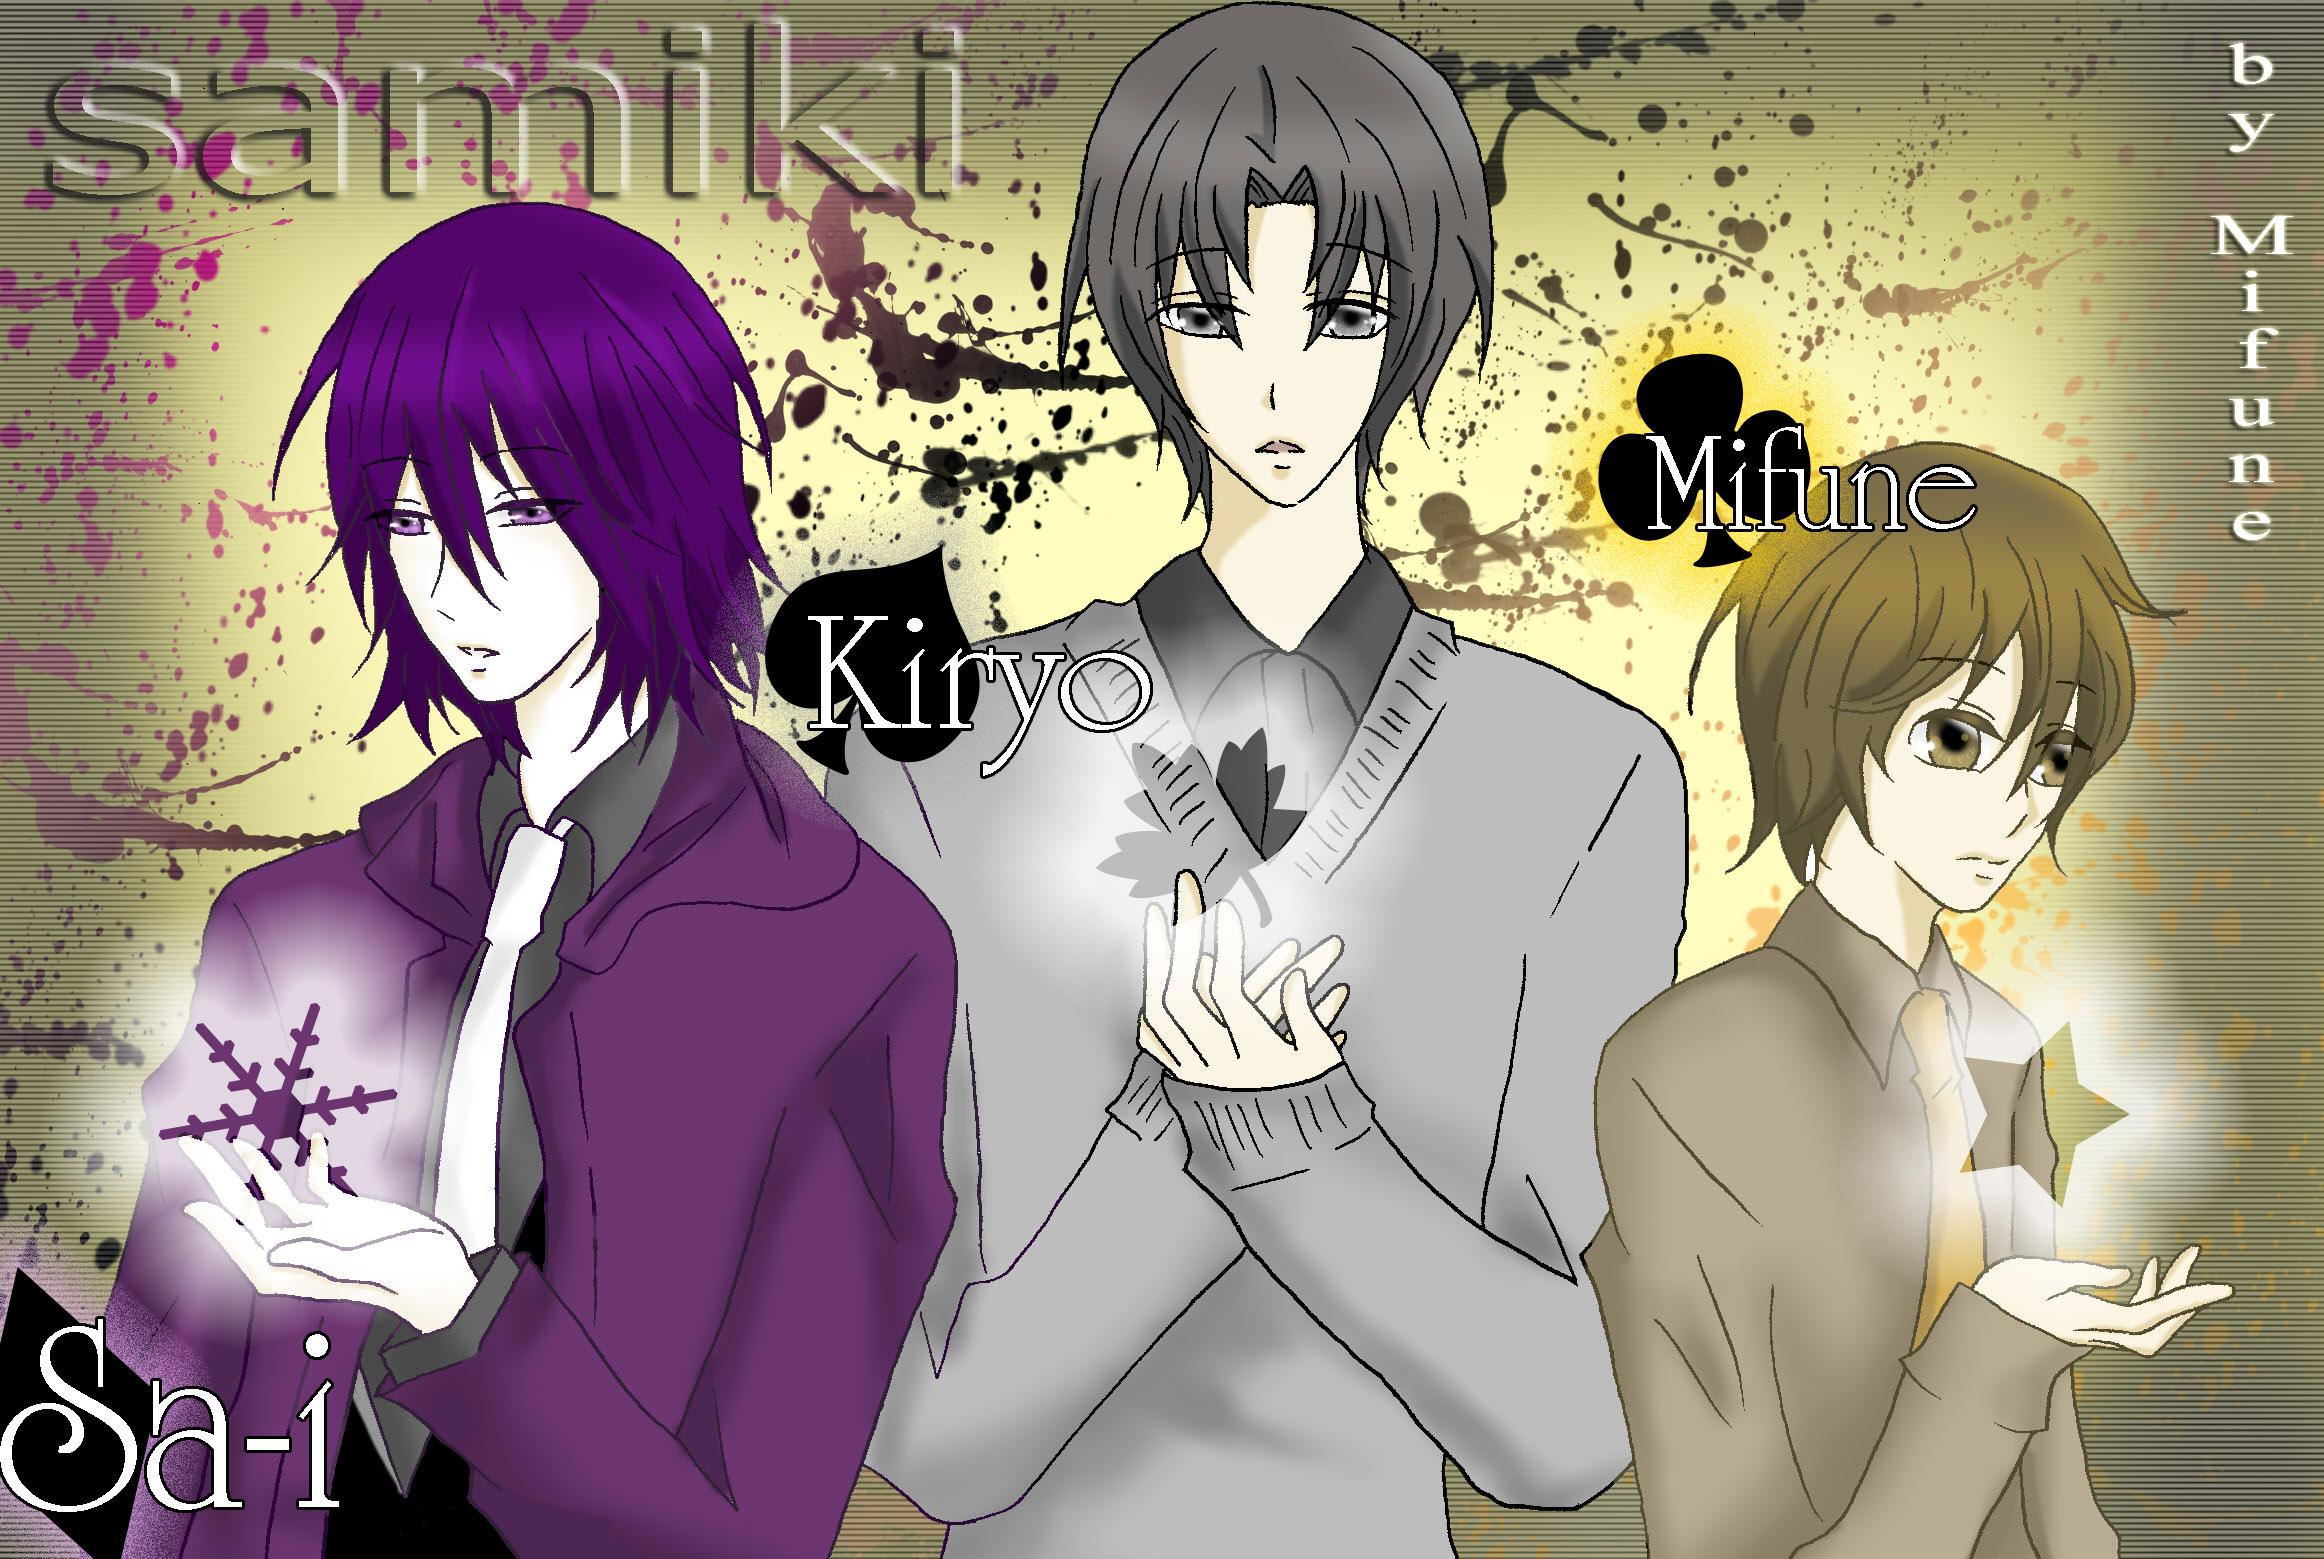 samiki 4 by Mifune84